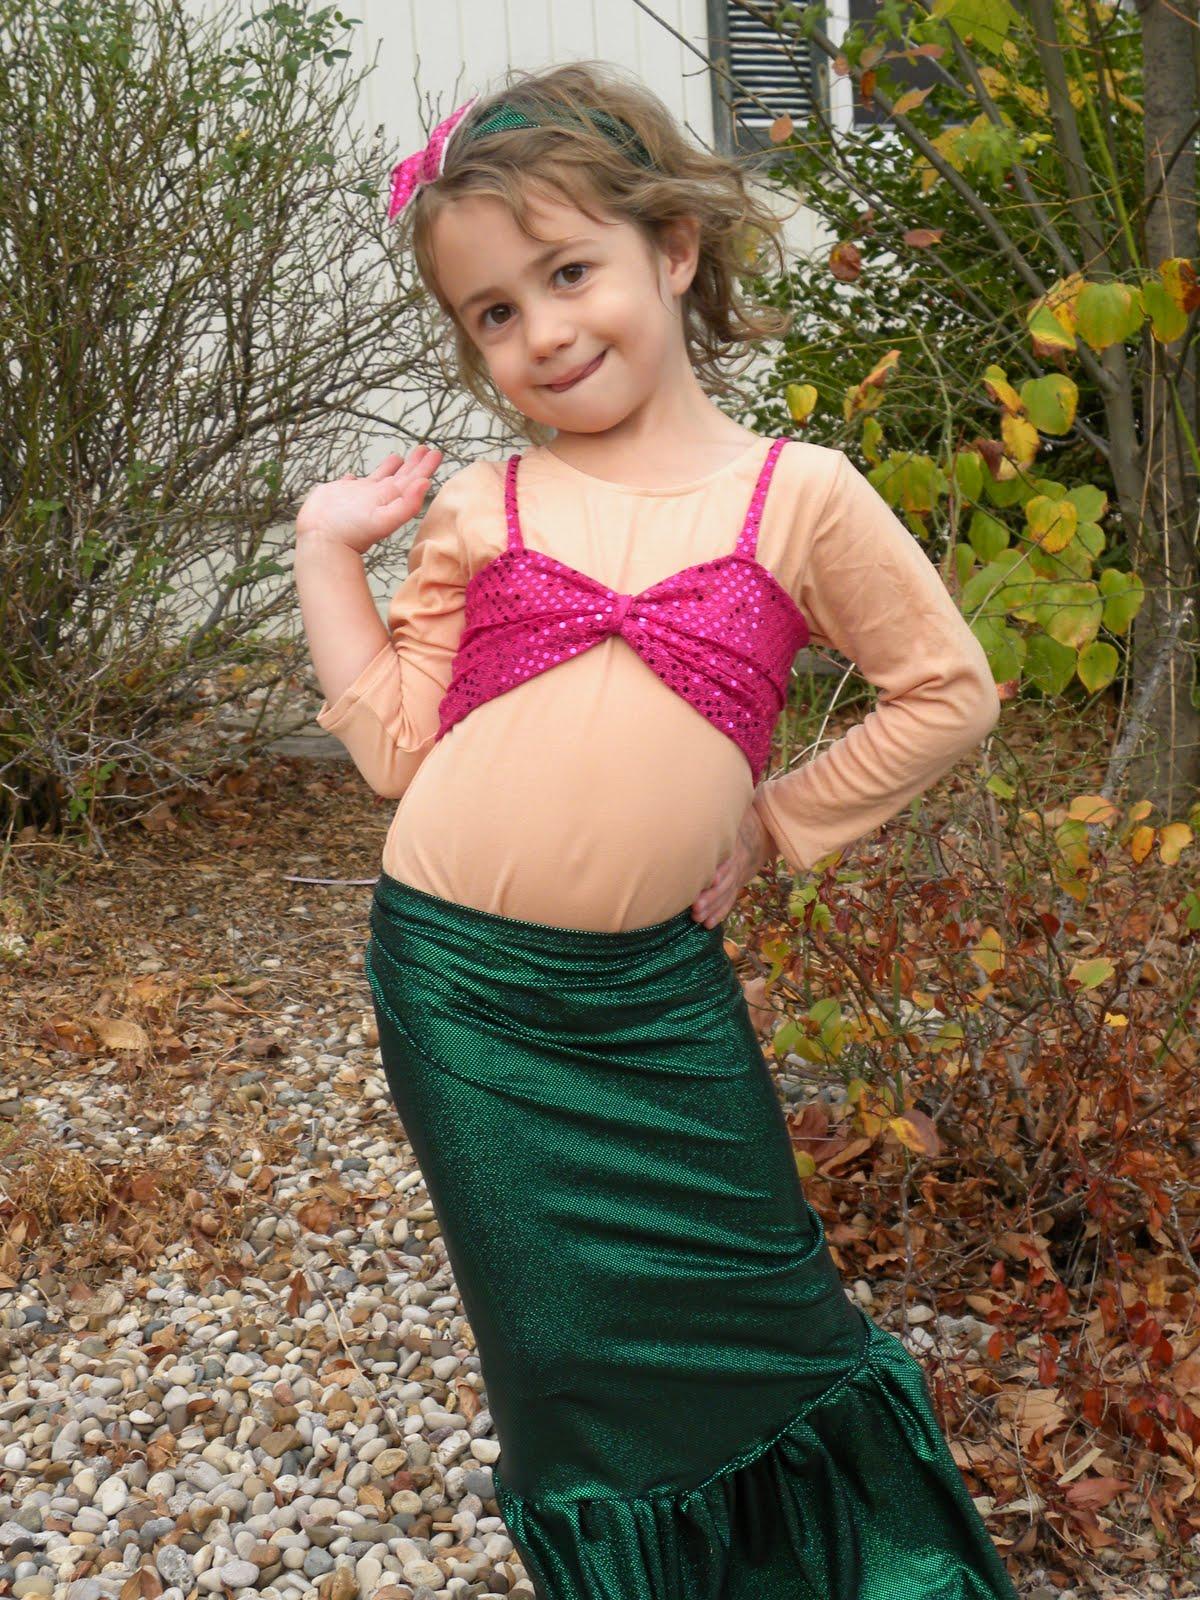 Cute Twins Baby Hd Wallpaper Non Nude Preteen Model Photos Newhairstylesformen2014 Com